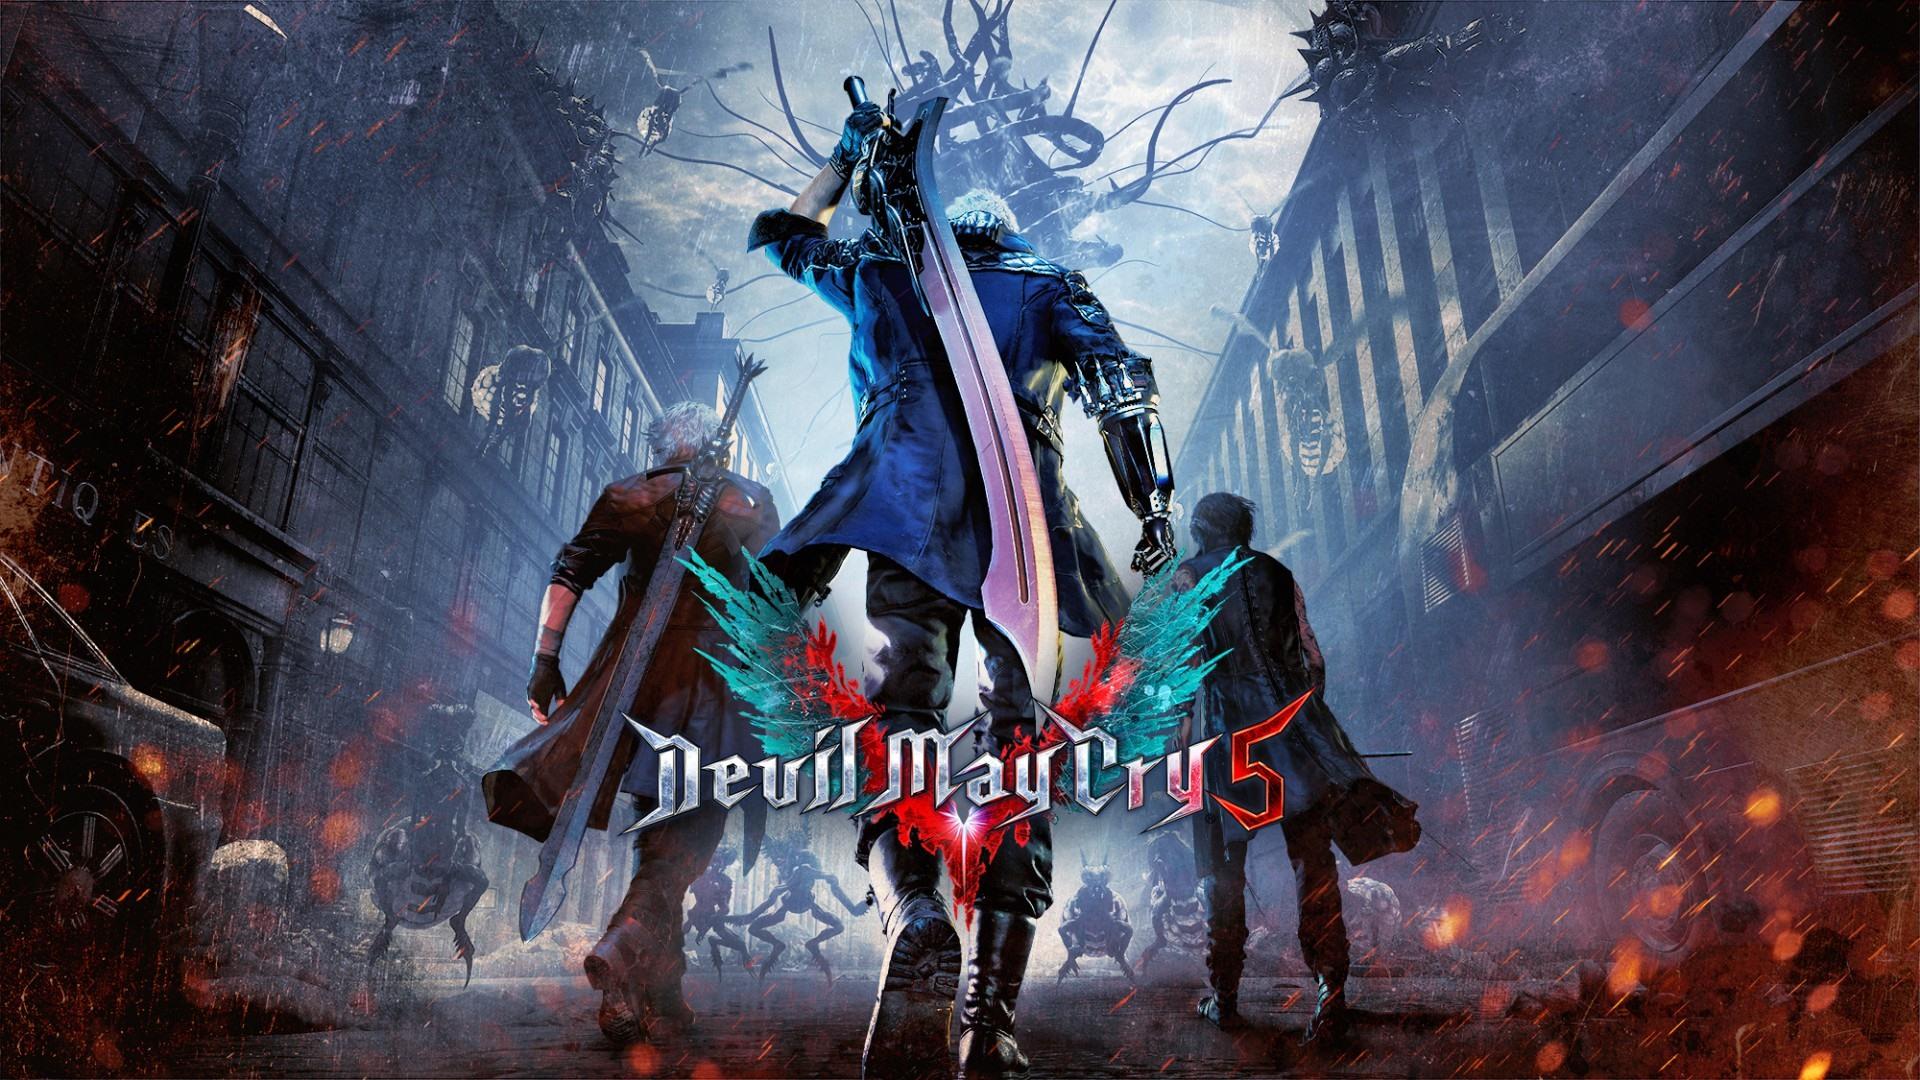 Wallpaper Devil May Cry 5 Video Game 1920x1080 Full Hd 2k